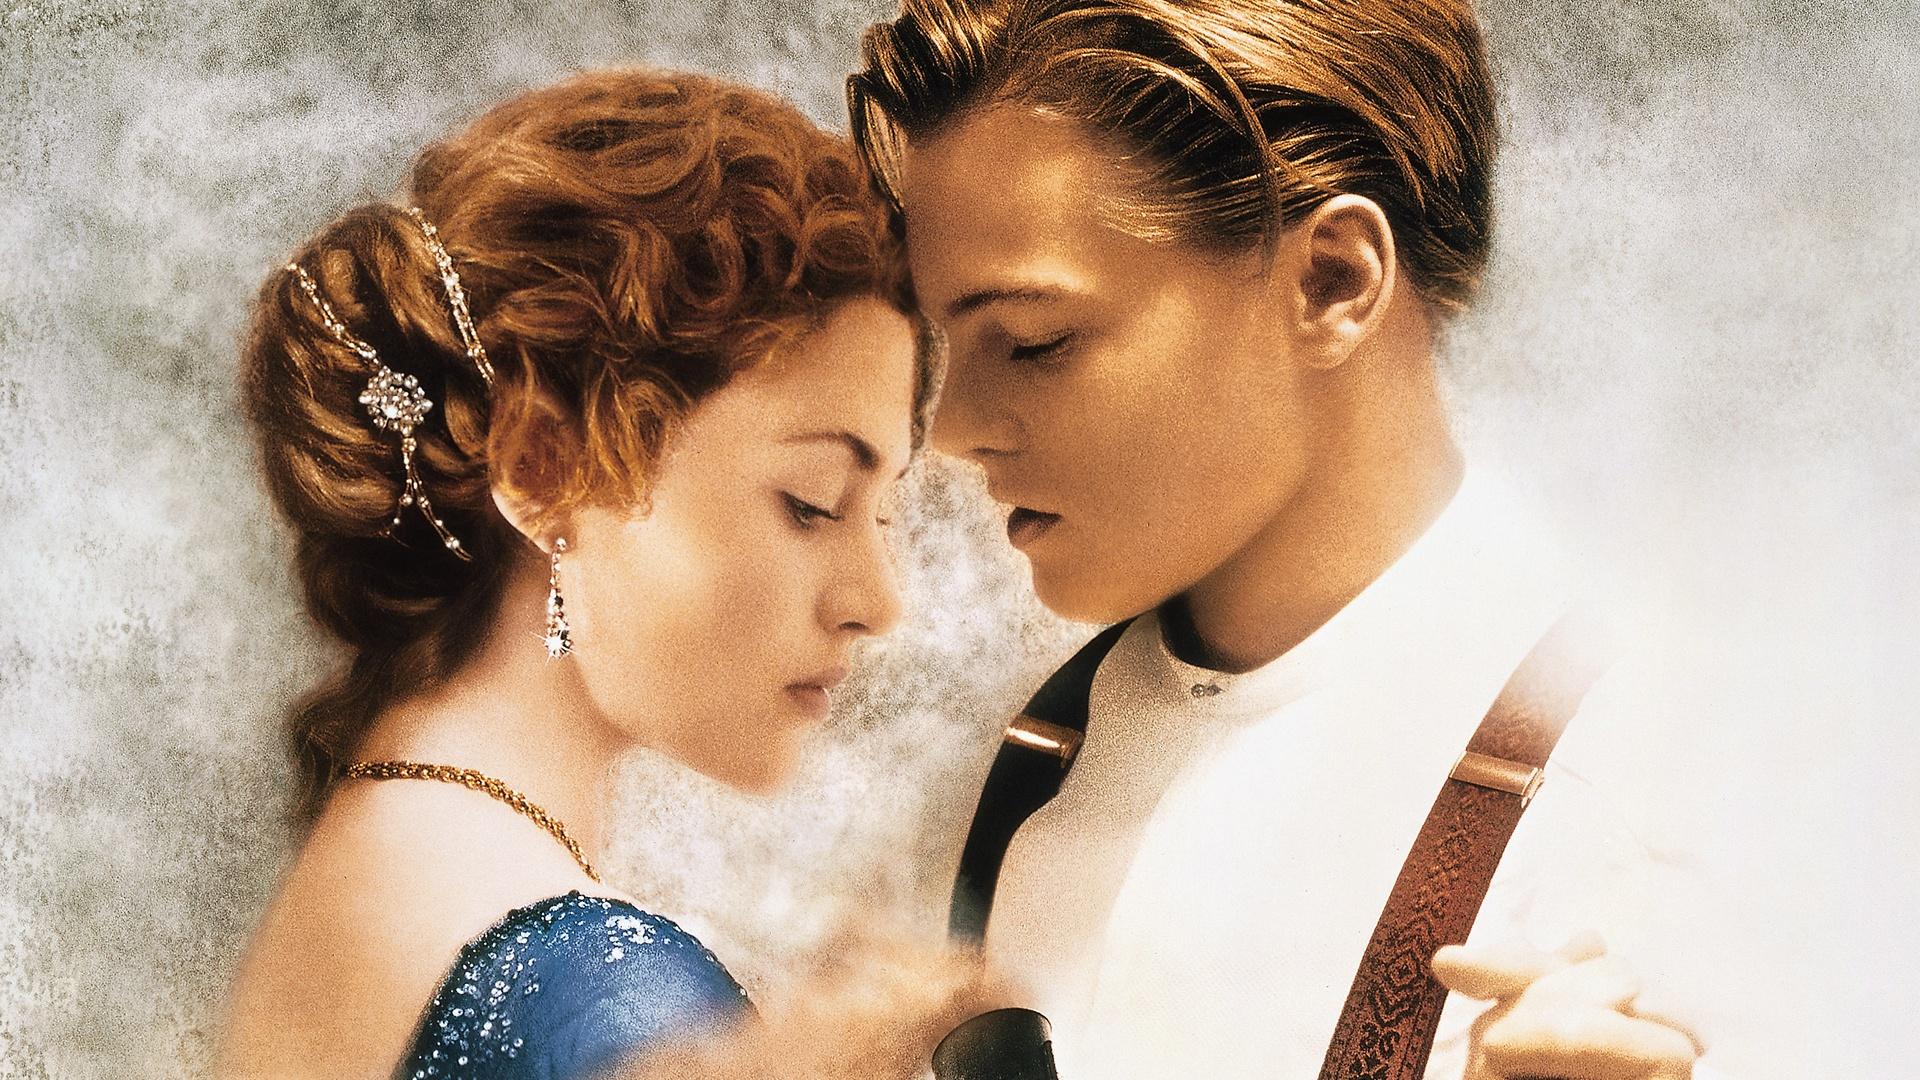 Titanic-1997-Valentines-Day-Wallpaper.jpg